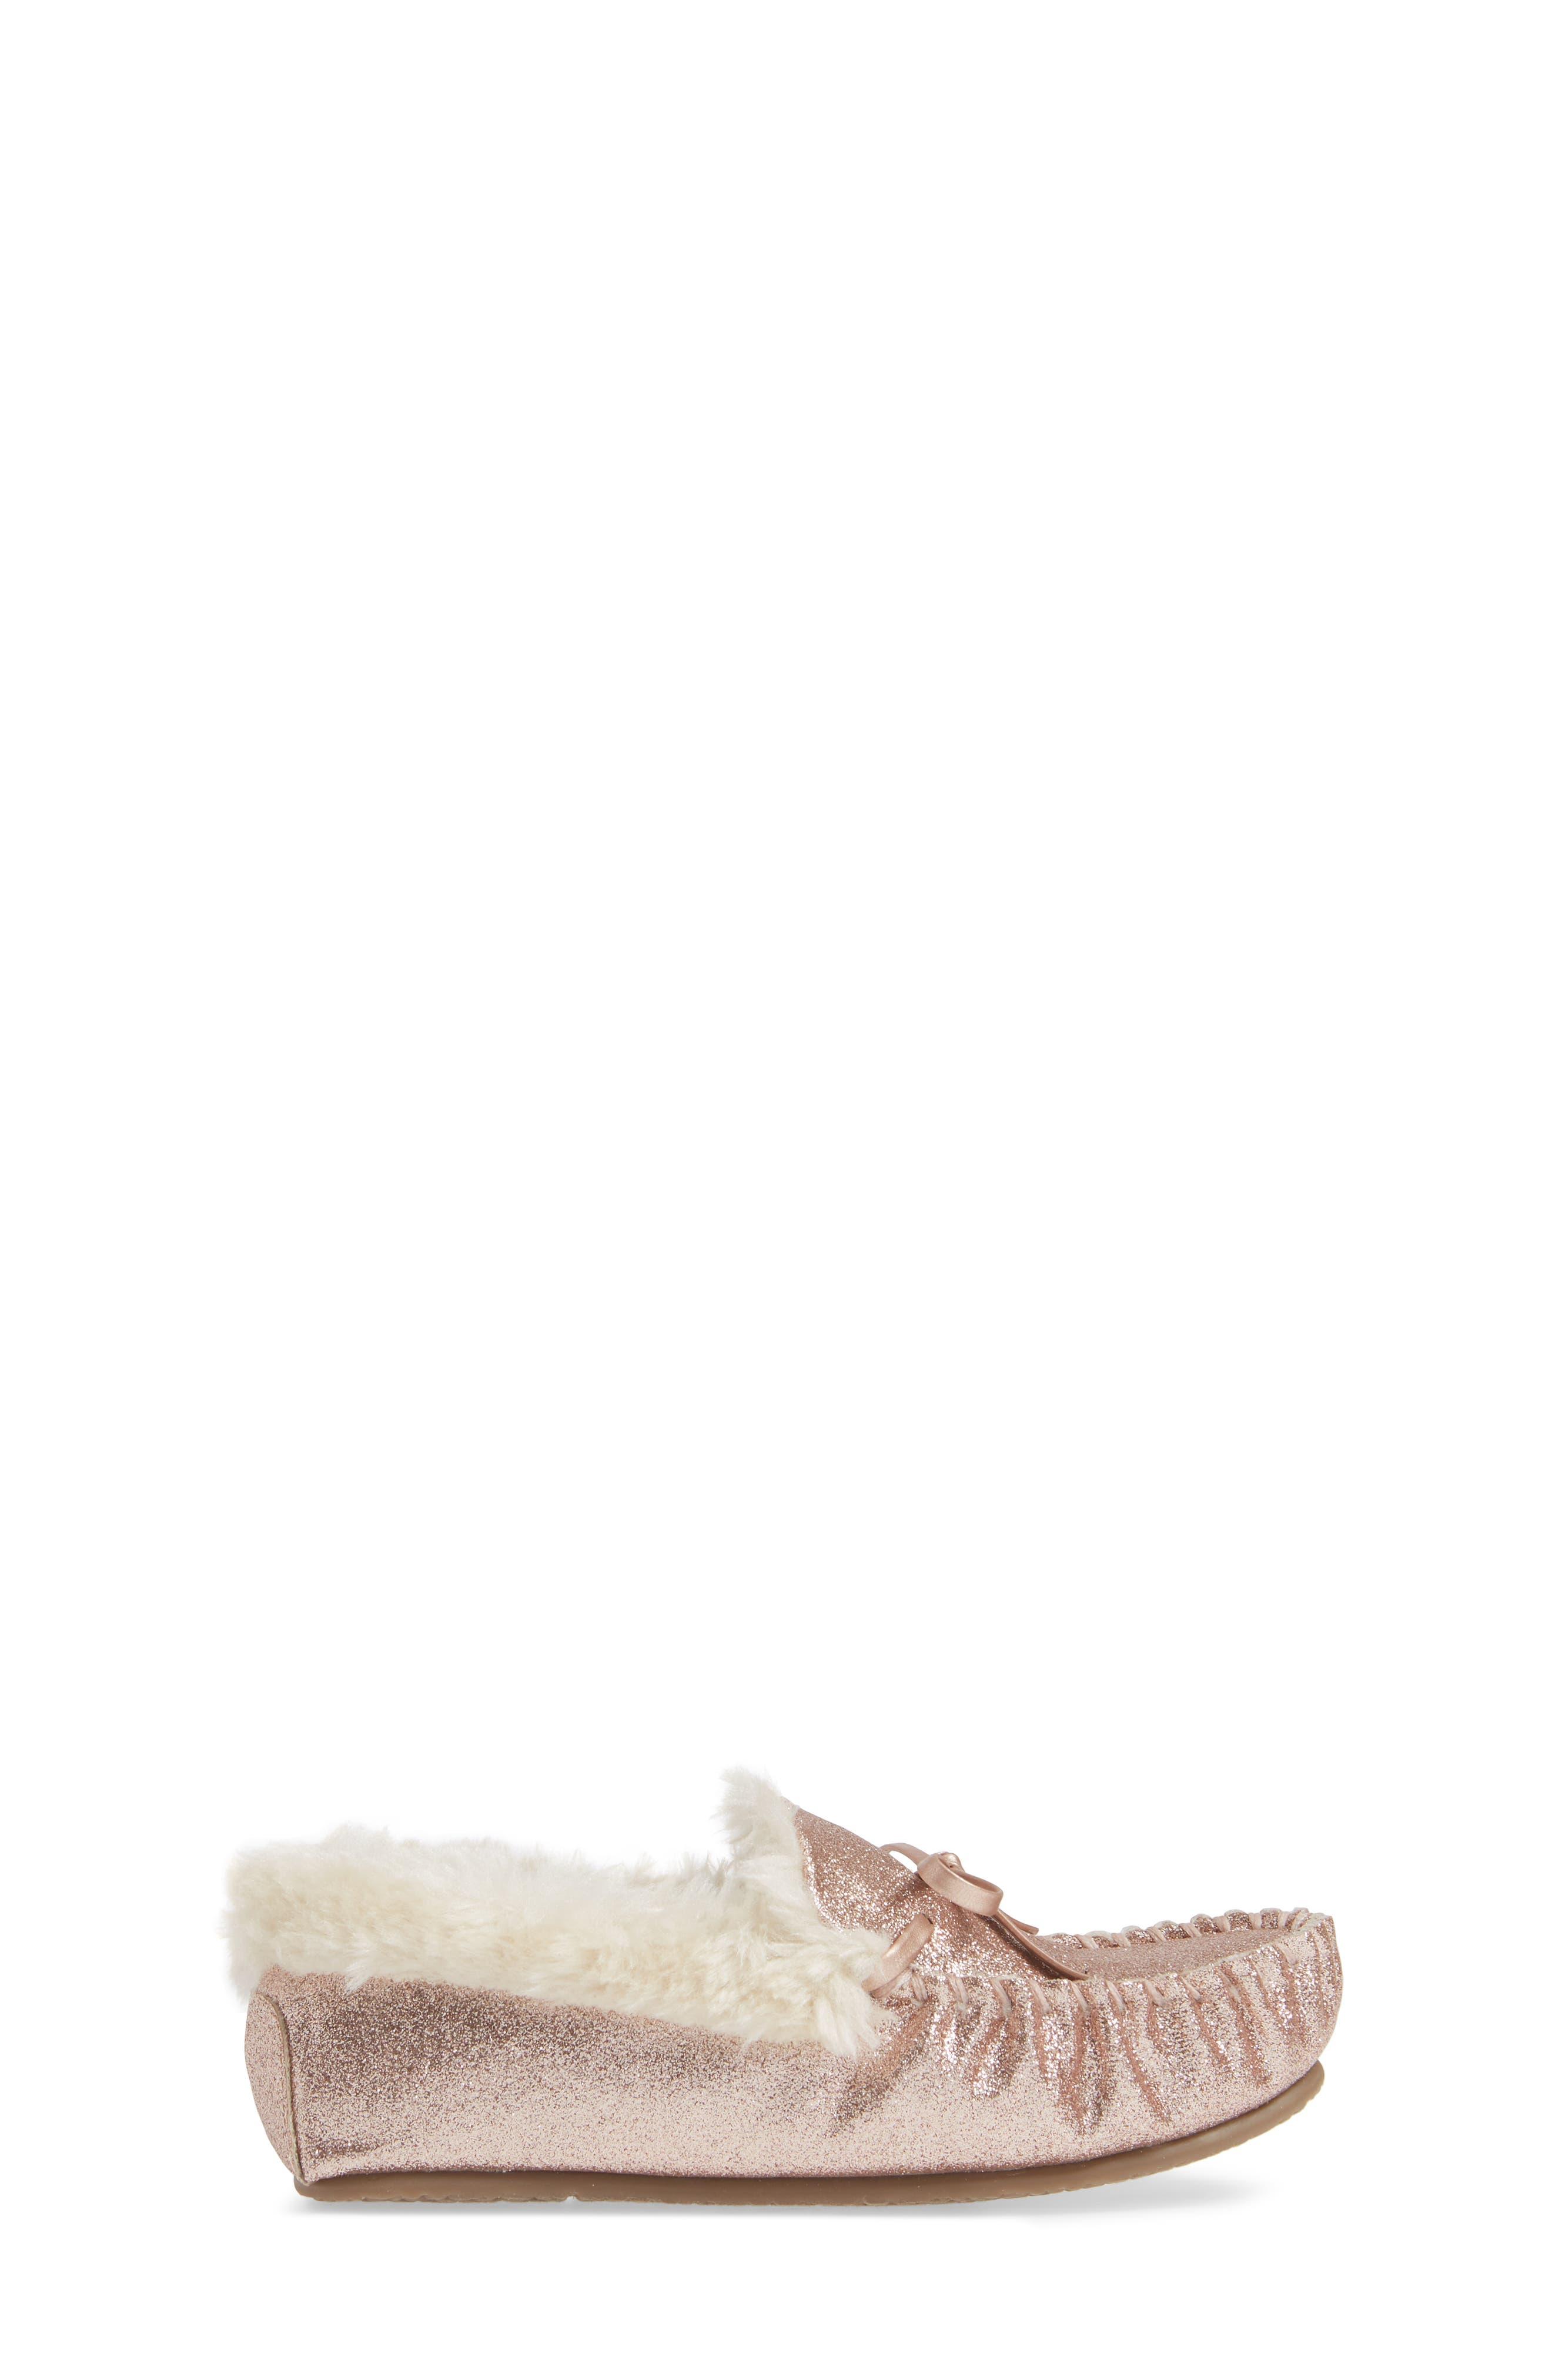 Mila Faux Fur Moccasin Slipper,                             Alternate thumbnail 3, color,                             710